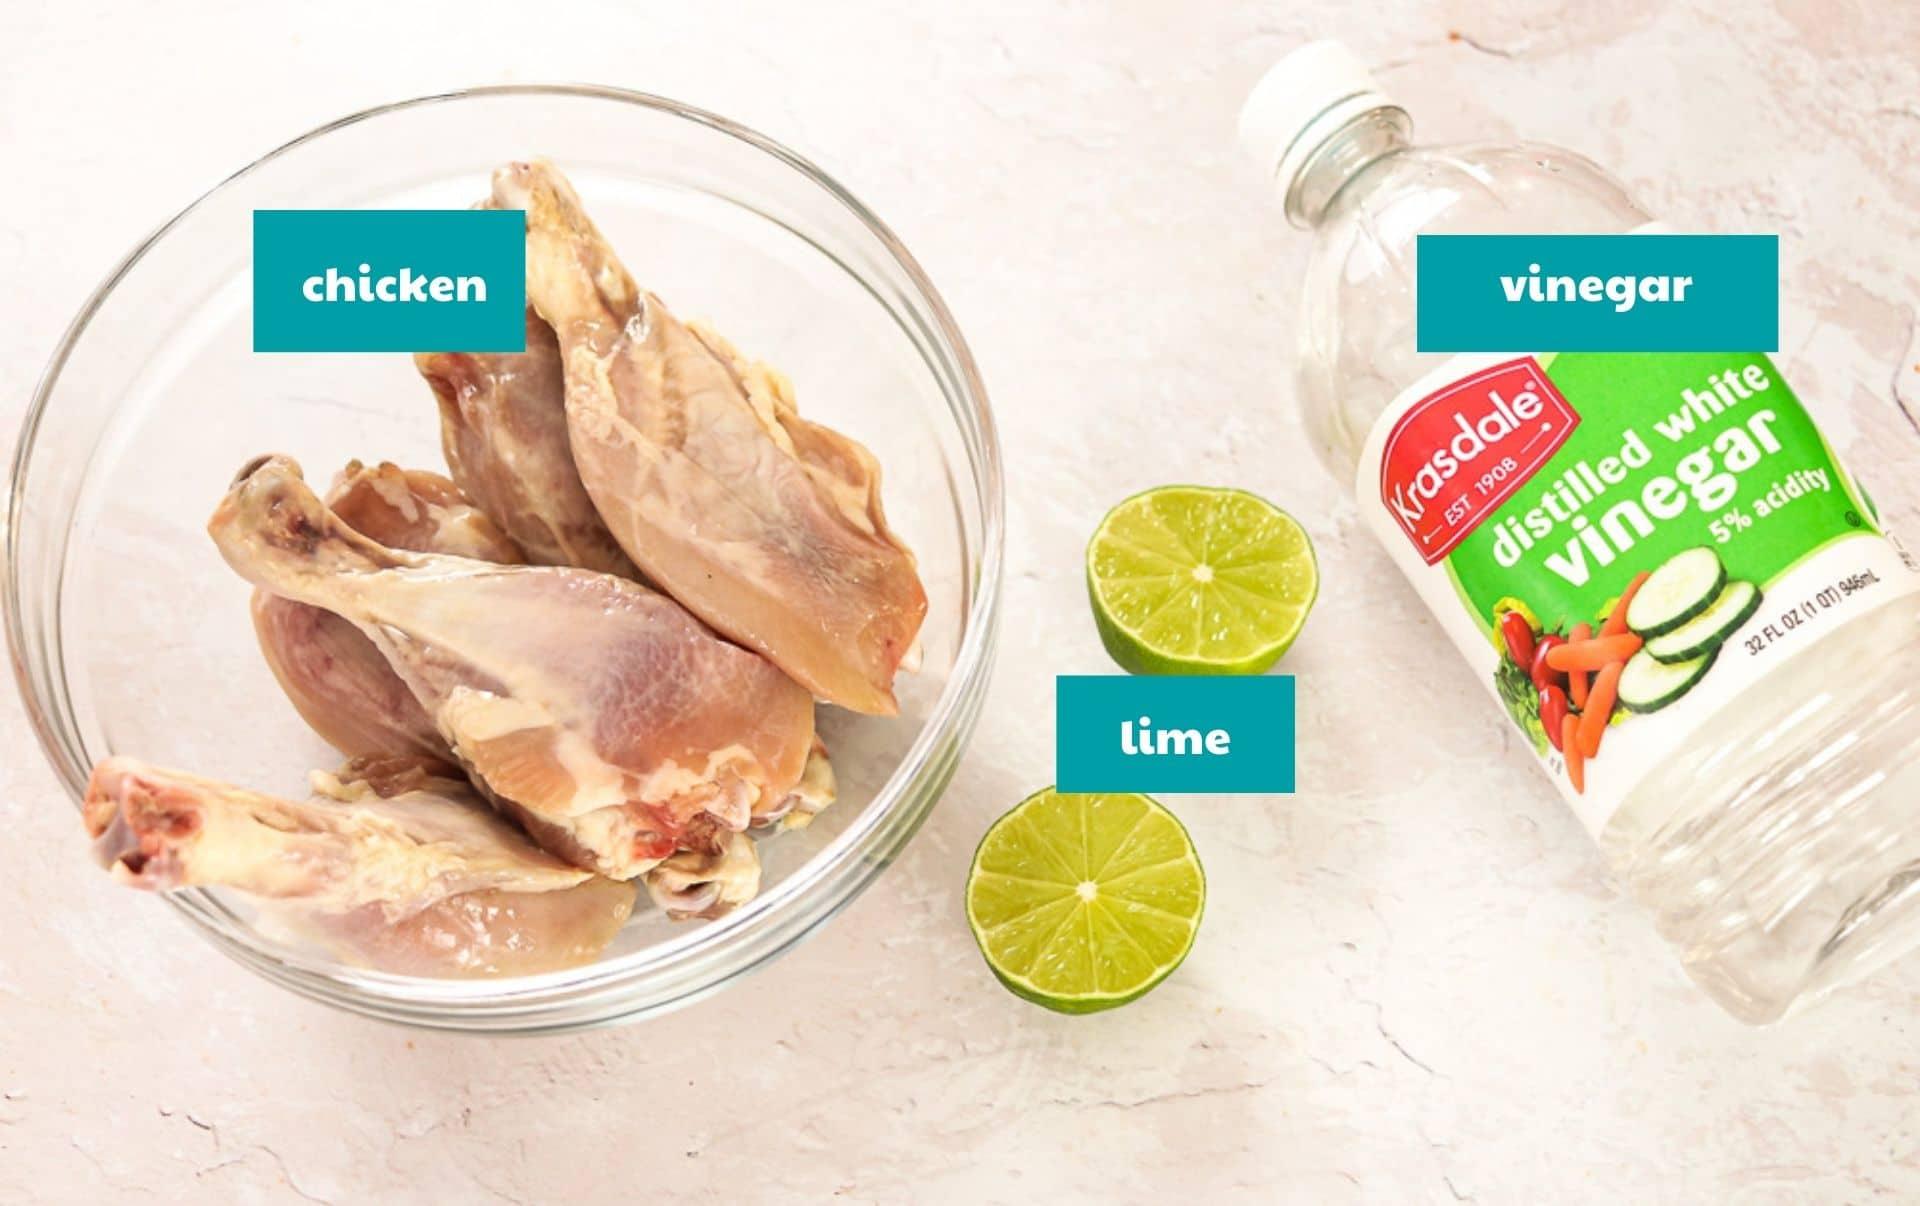 Ingredients to clean chicken